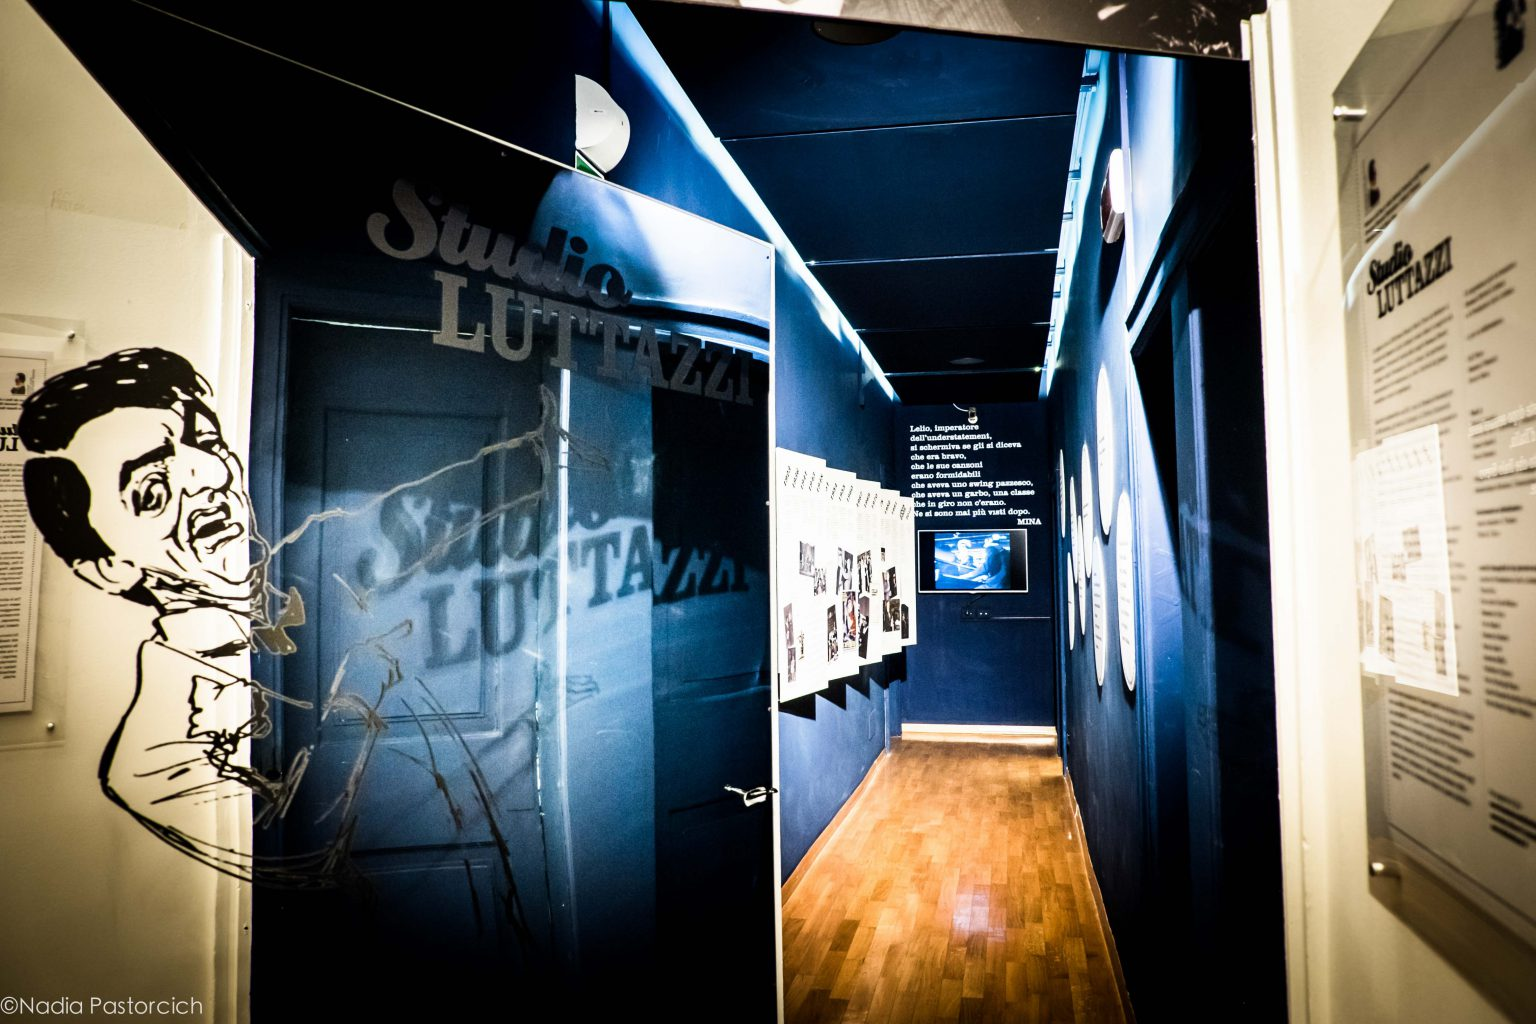 Studio Luttazzi